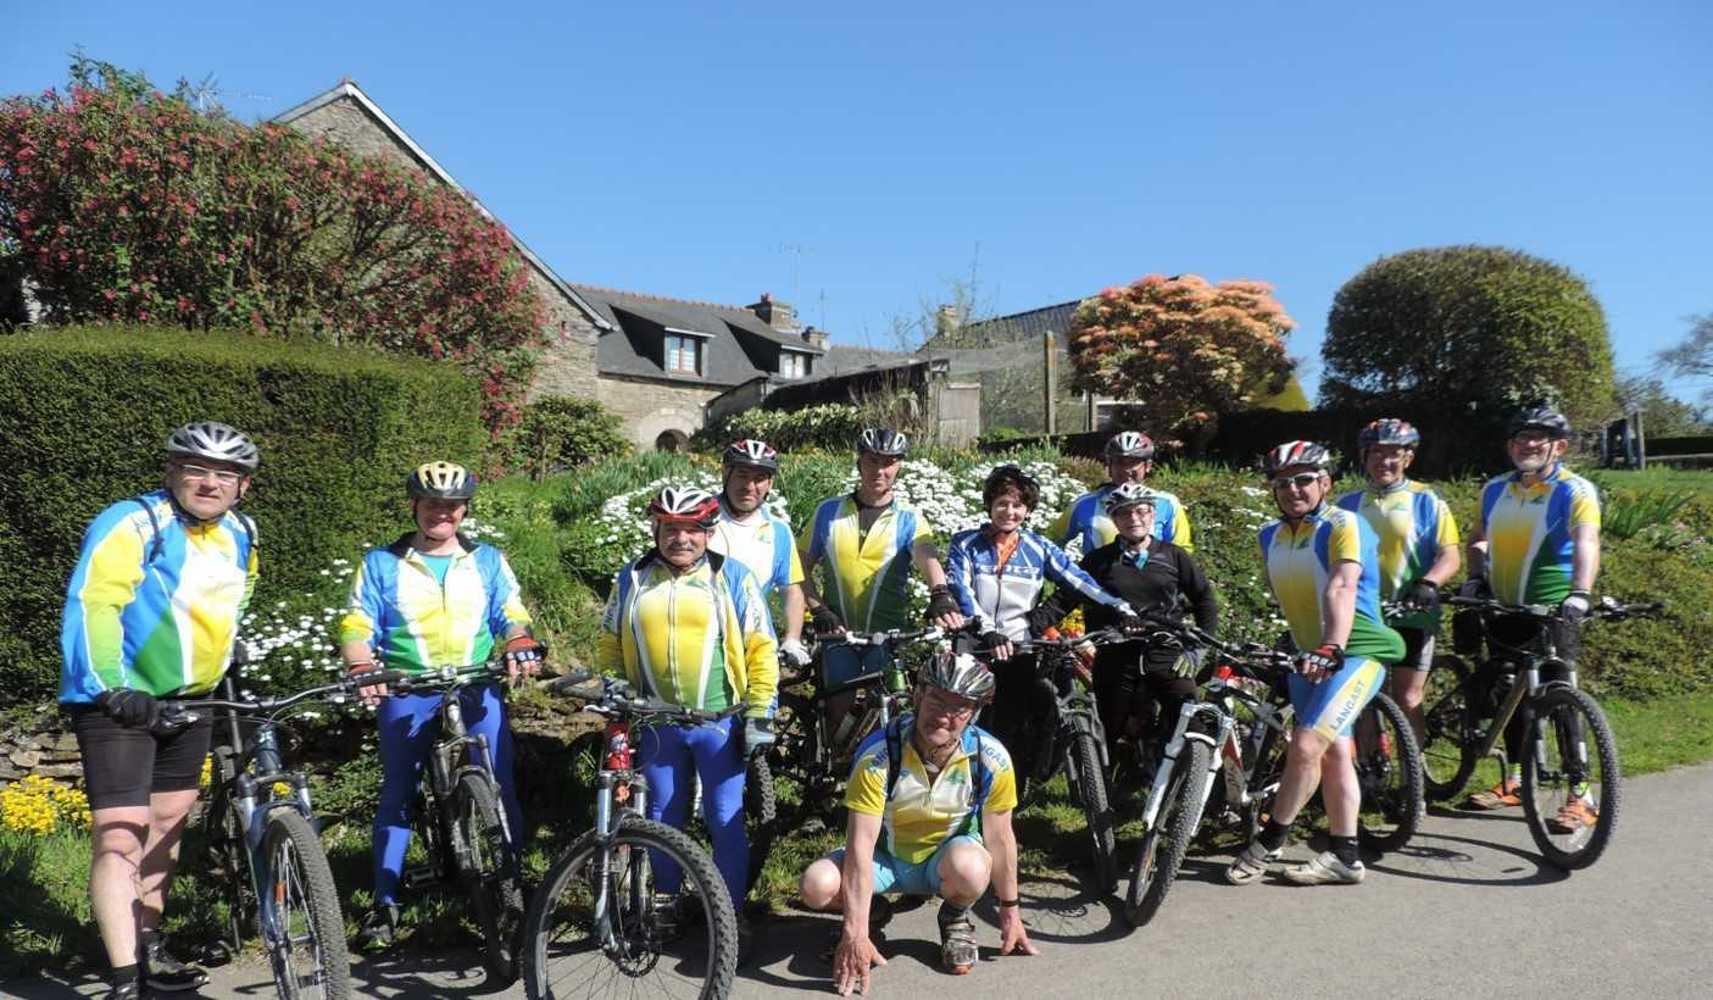 Club Cyclotouriste Langastien image1